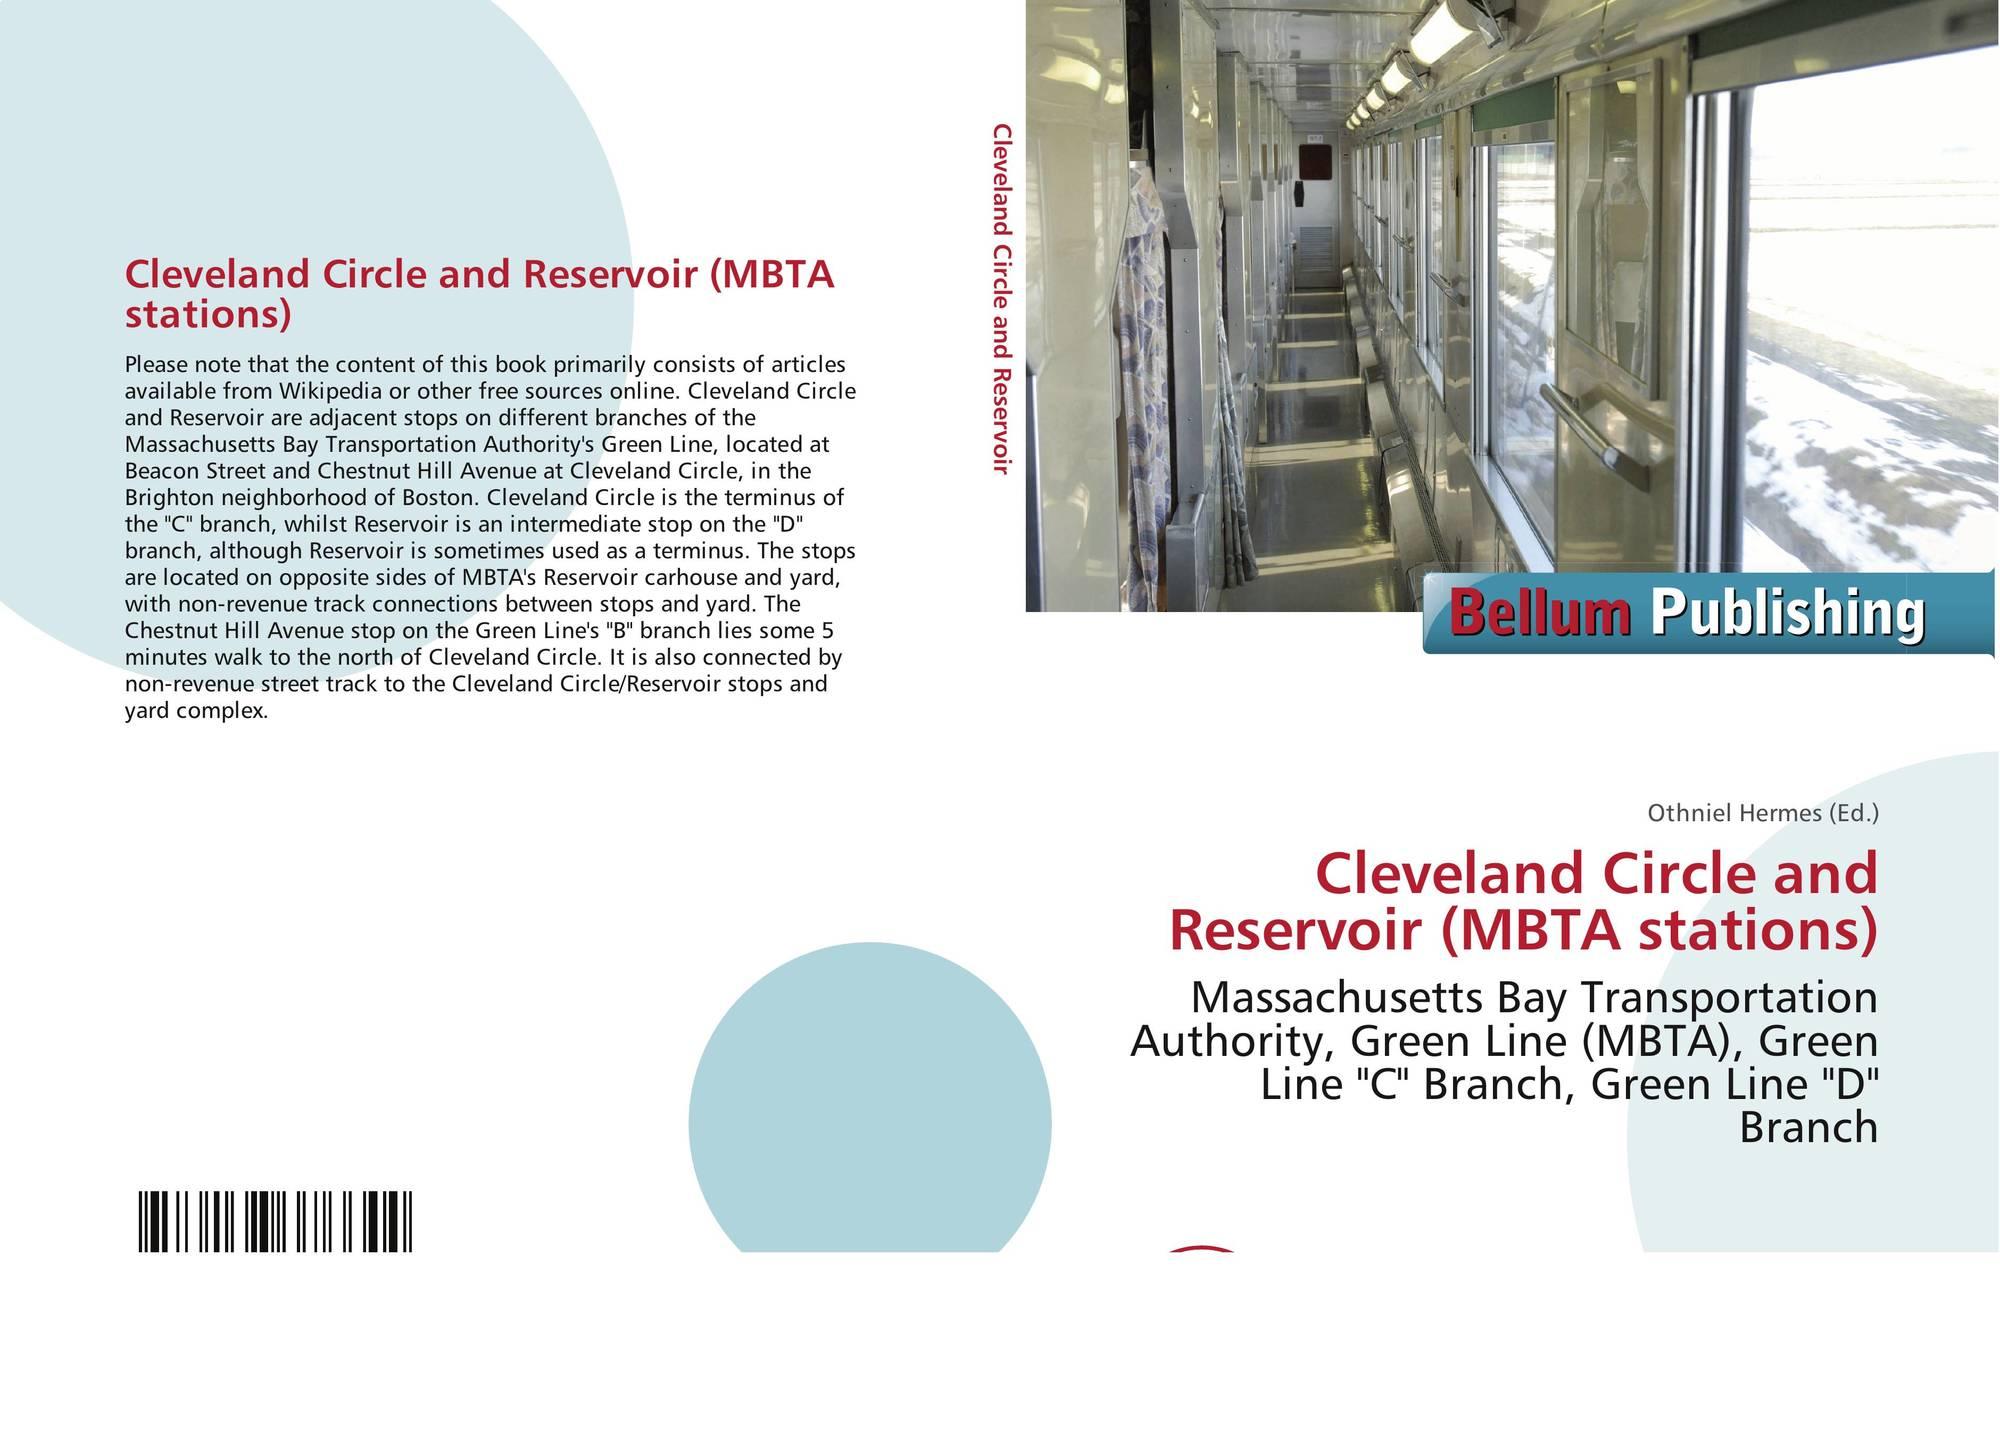 Cleveland Circle and Reservoir (MBTA stations), 978-613-8